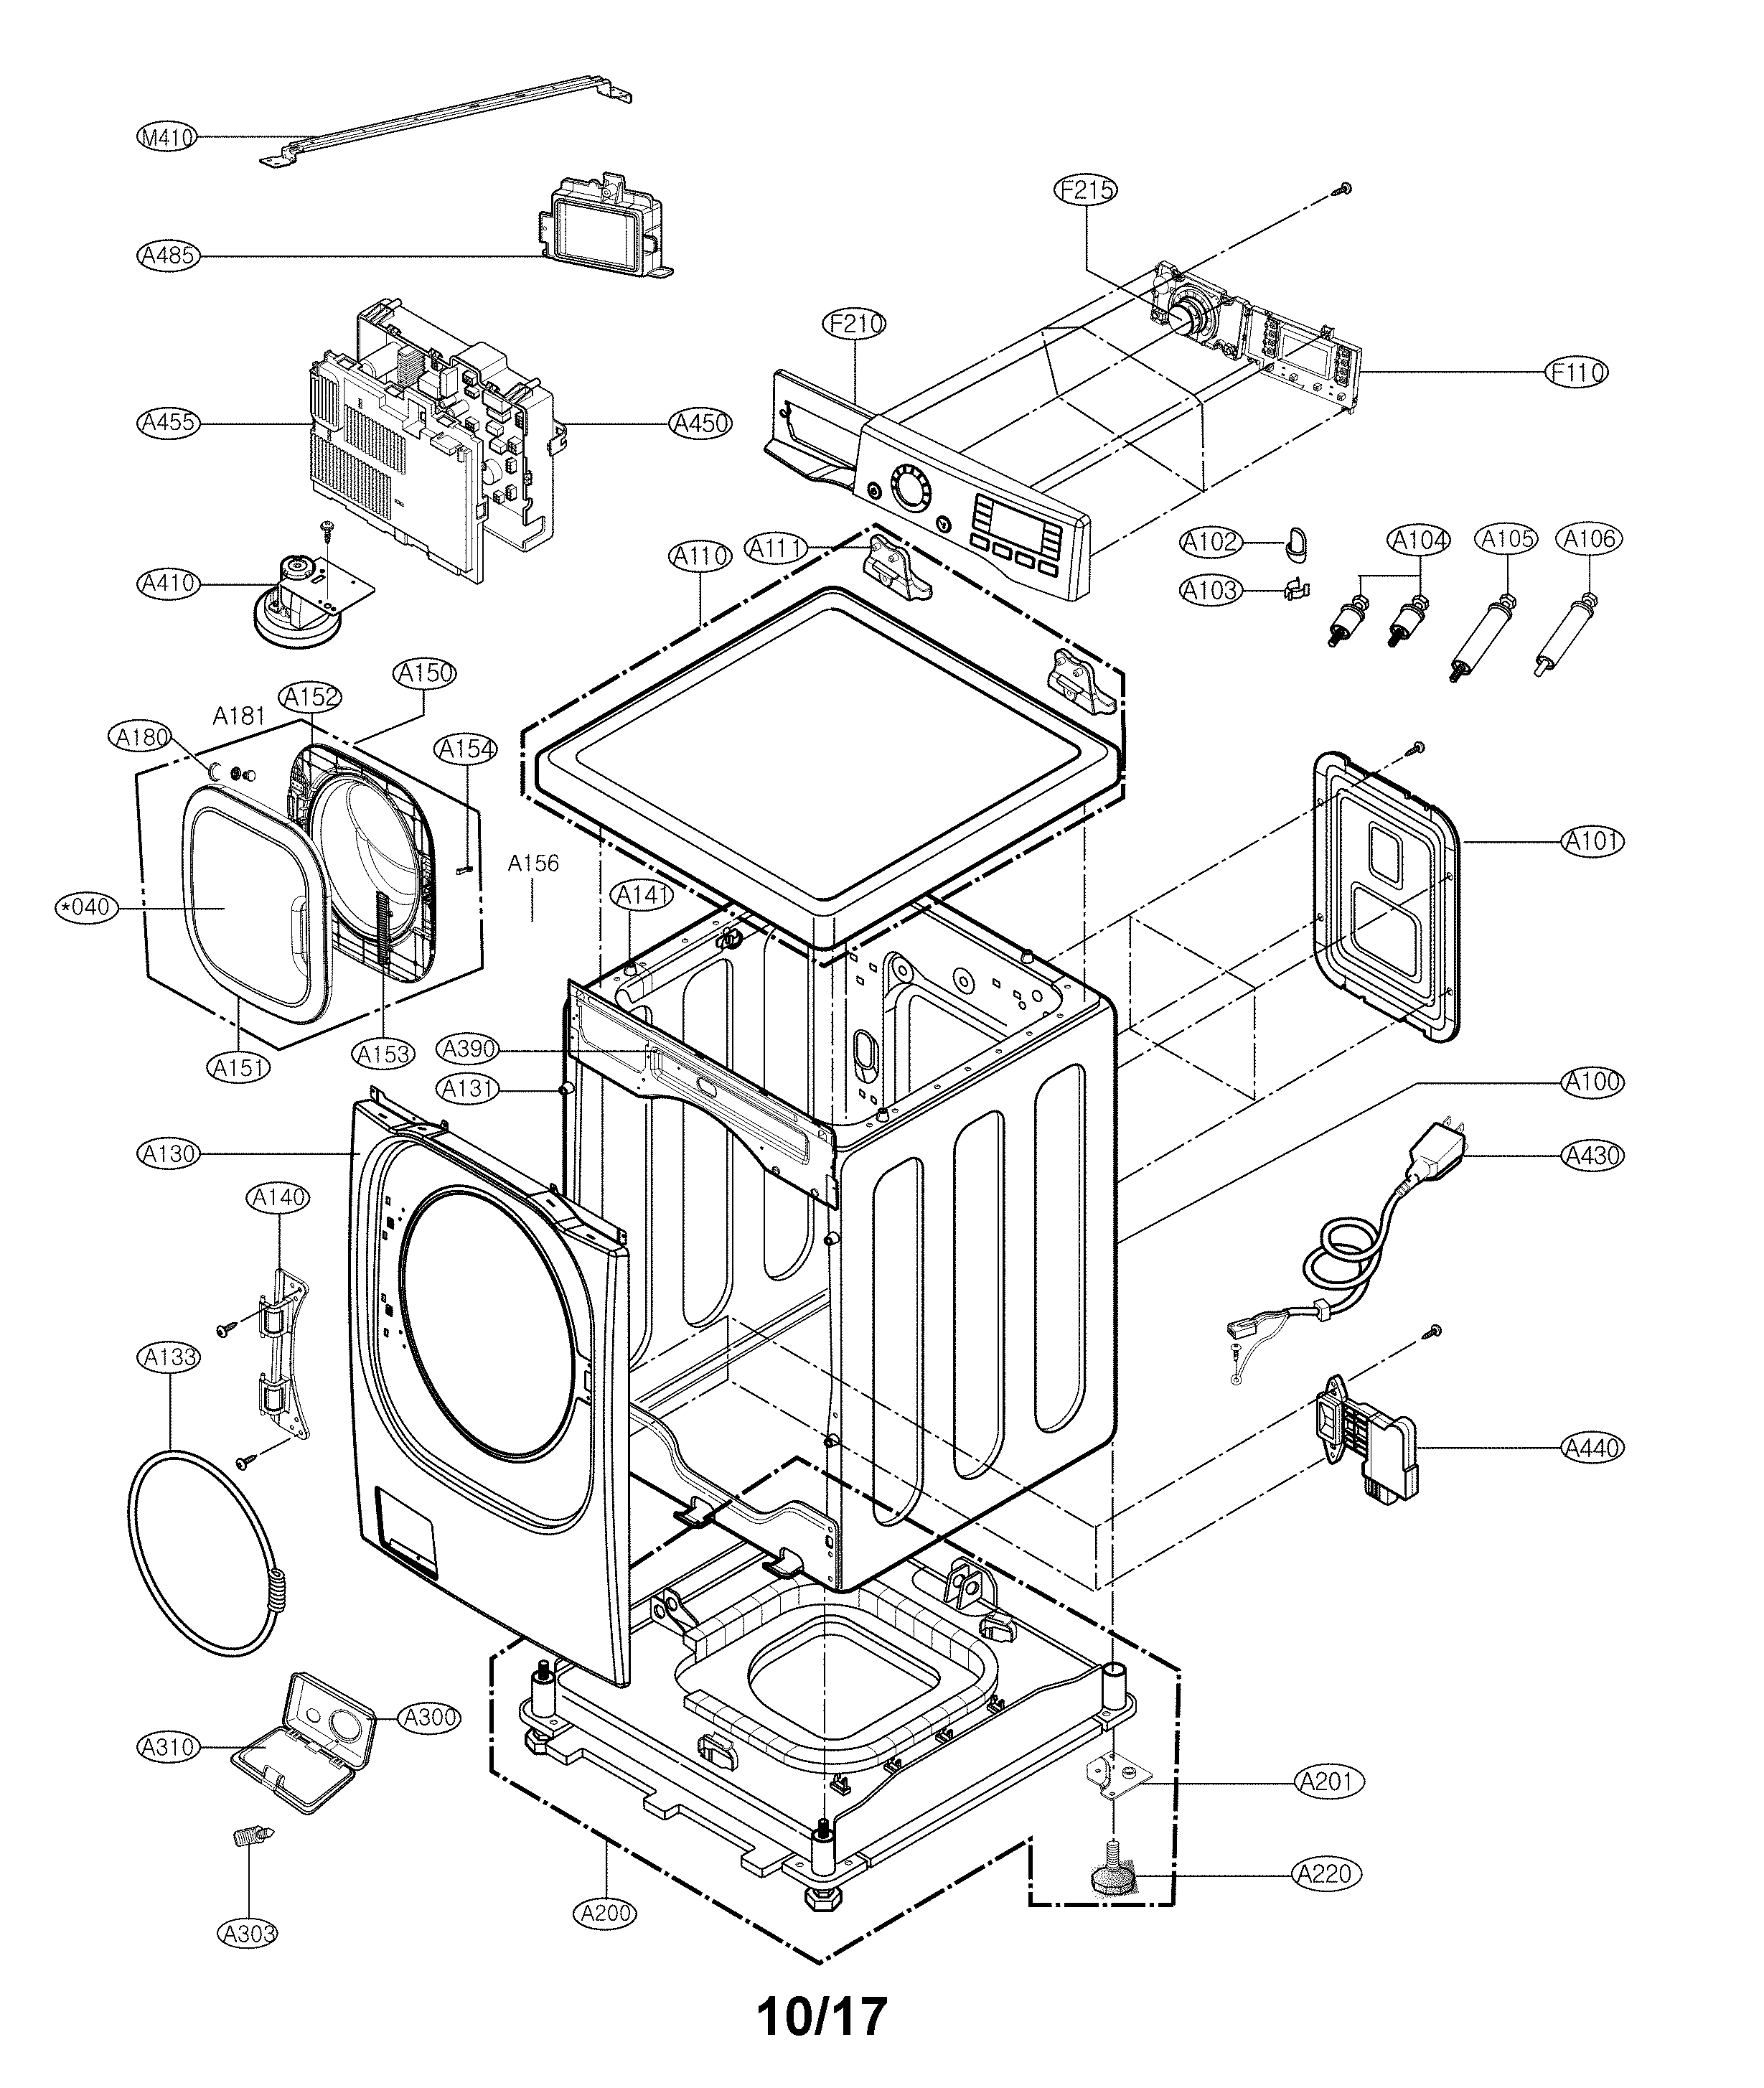 Lg Wm4370hka Washer Drain Pump And Motor Assembly